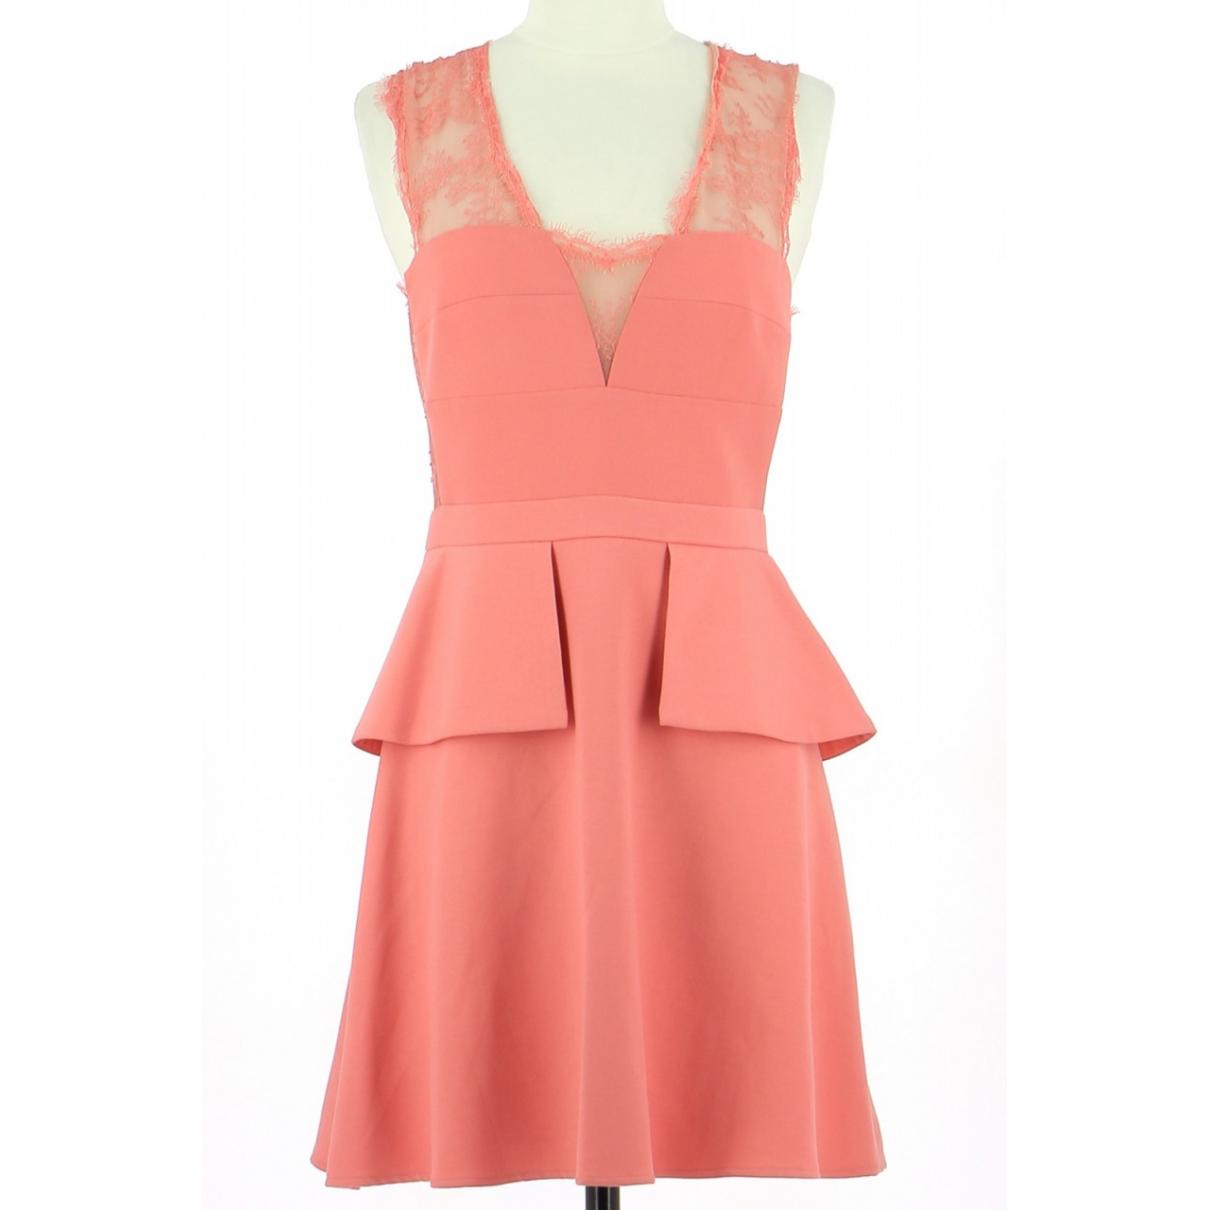 Bcbg Max Azria \N Kleid in  Rosa Polyester